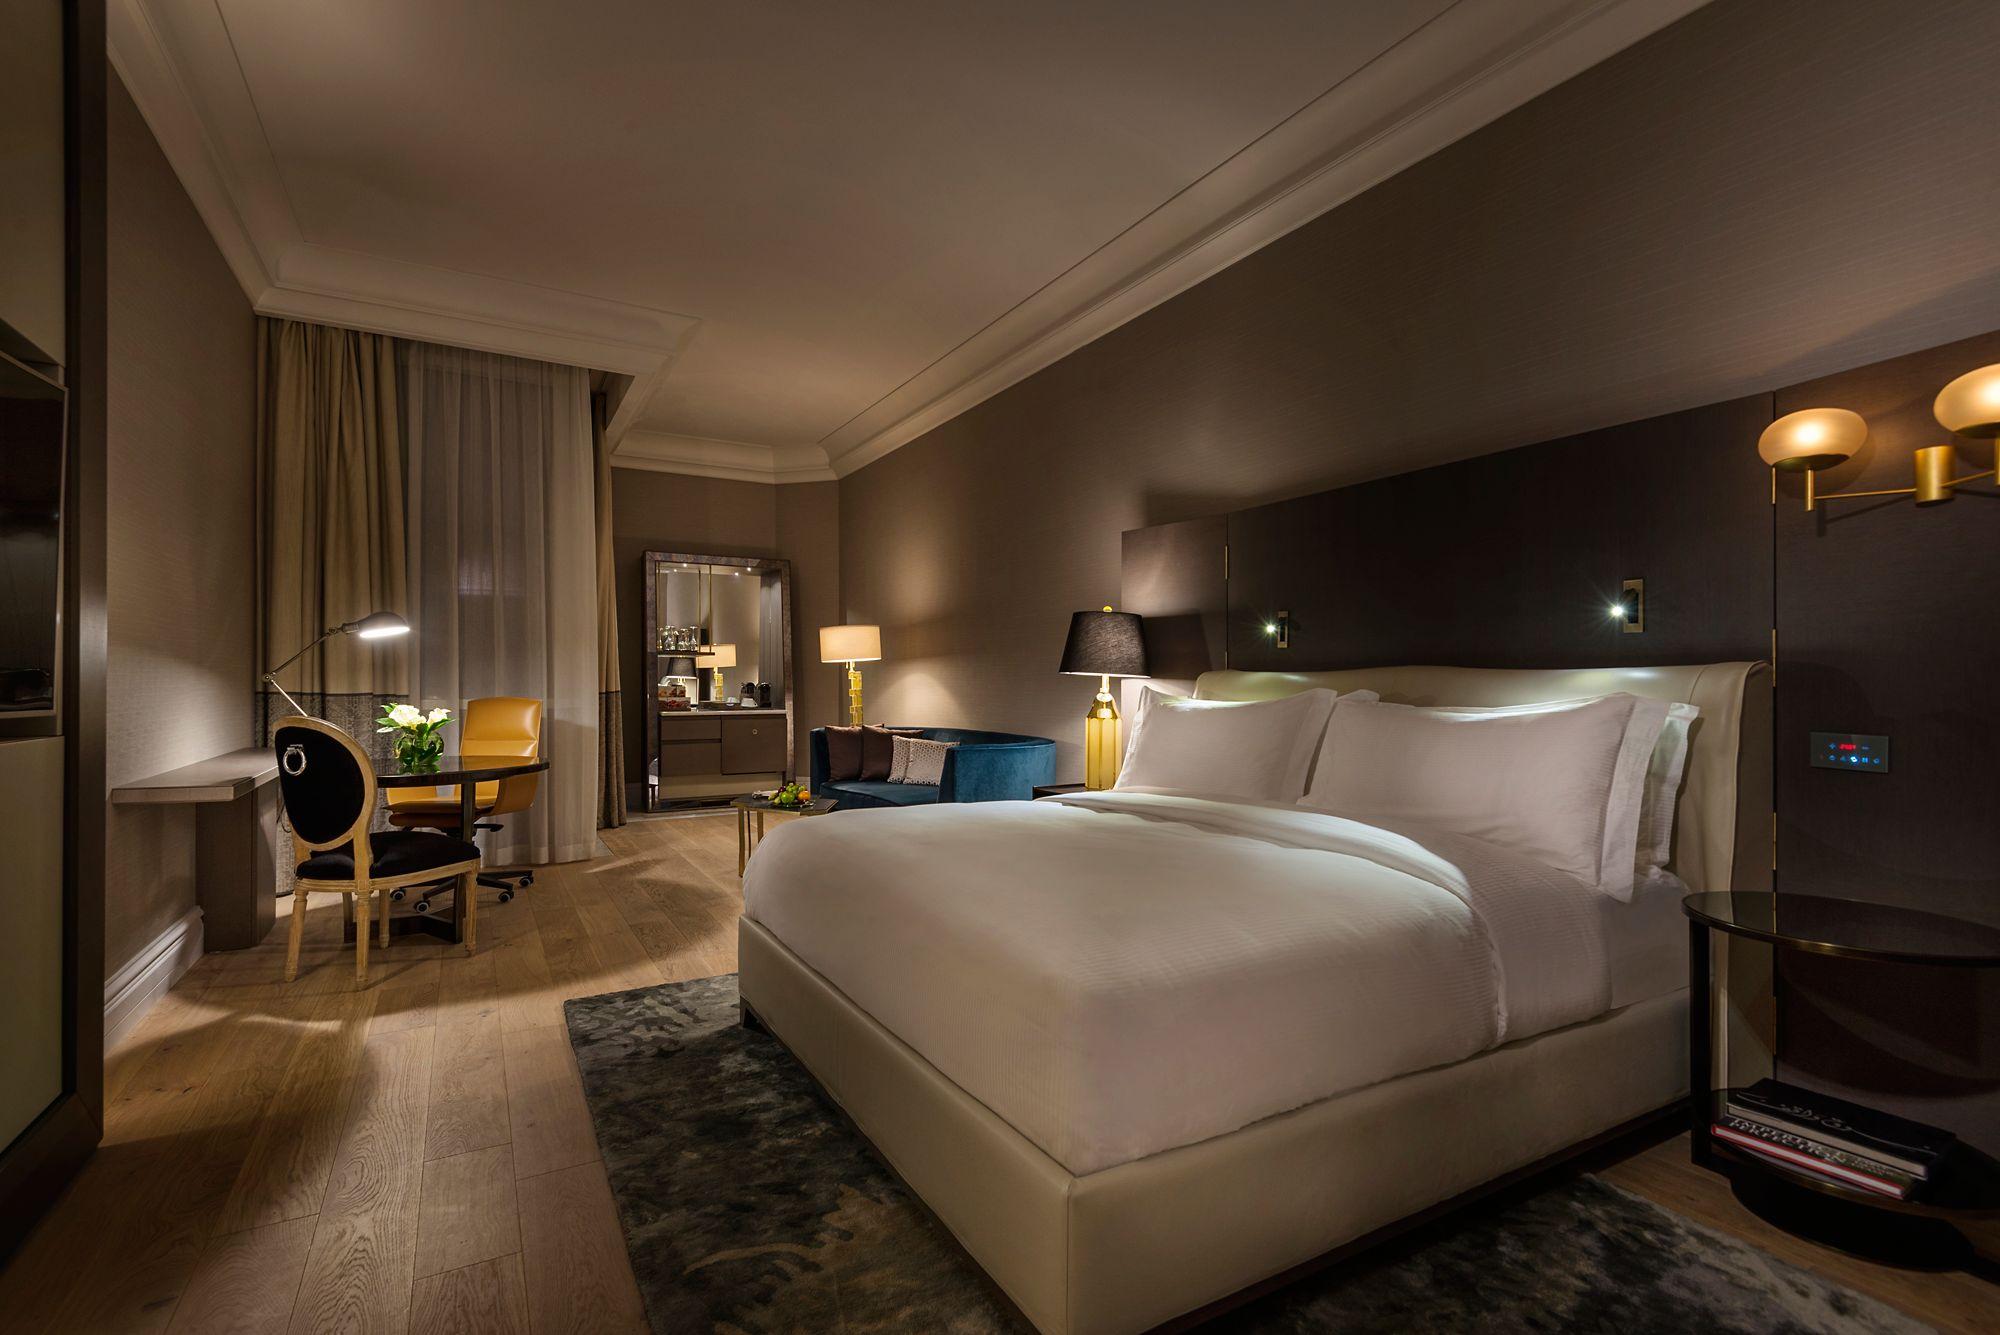 Deluxe Room in Doha, Qatar | The Ritz-Carlton, Doha